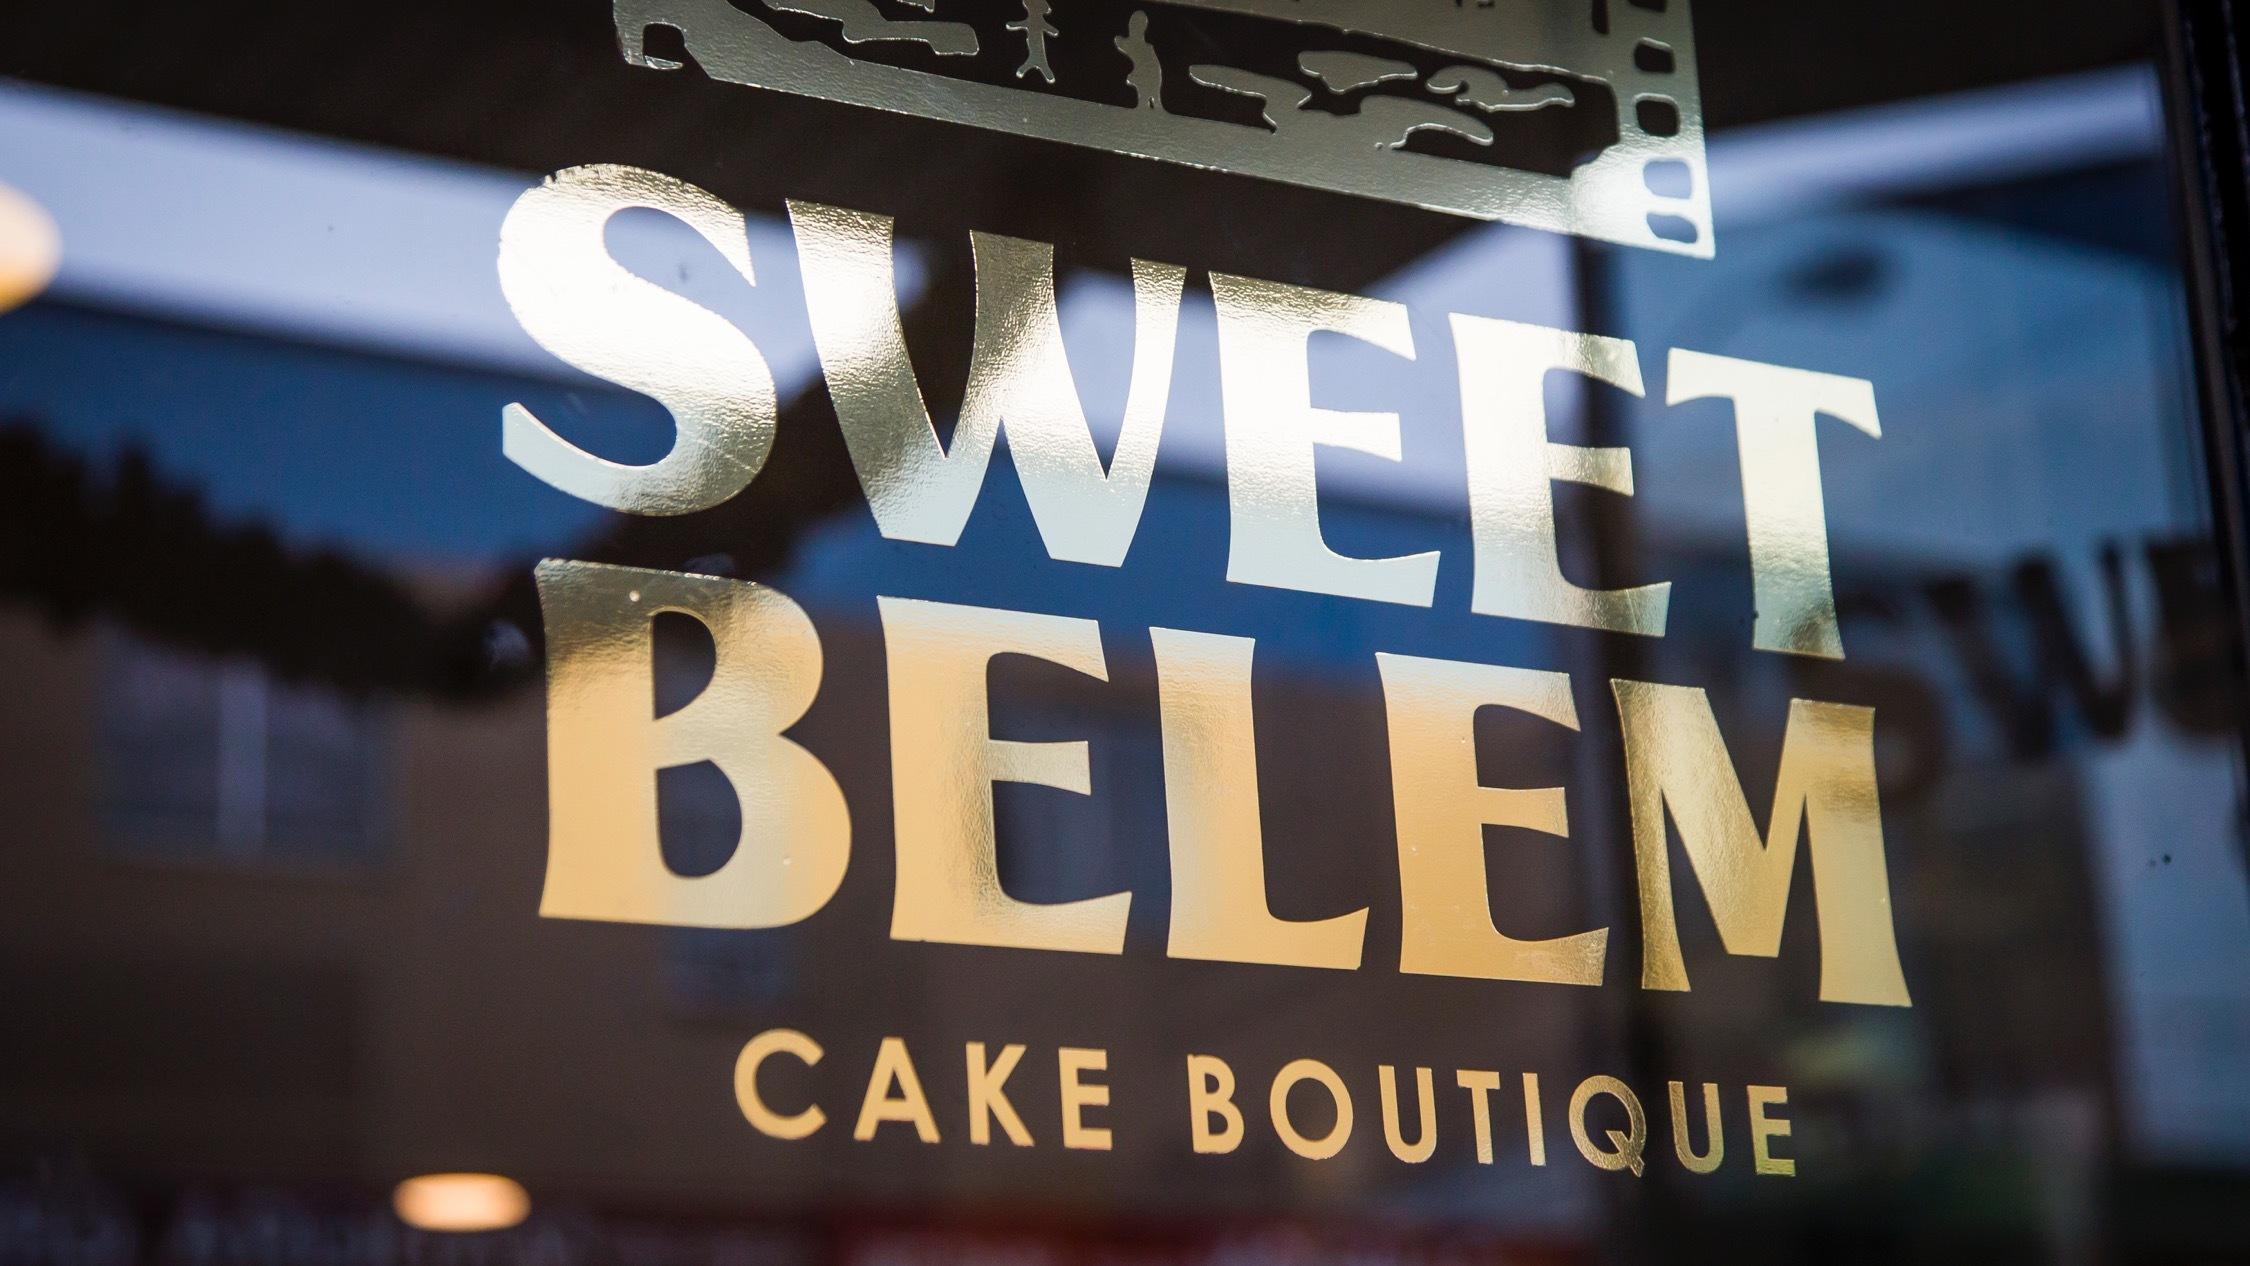 Sweet Belem